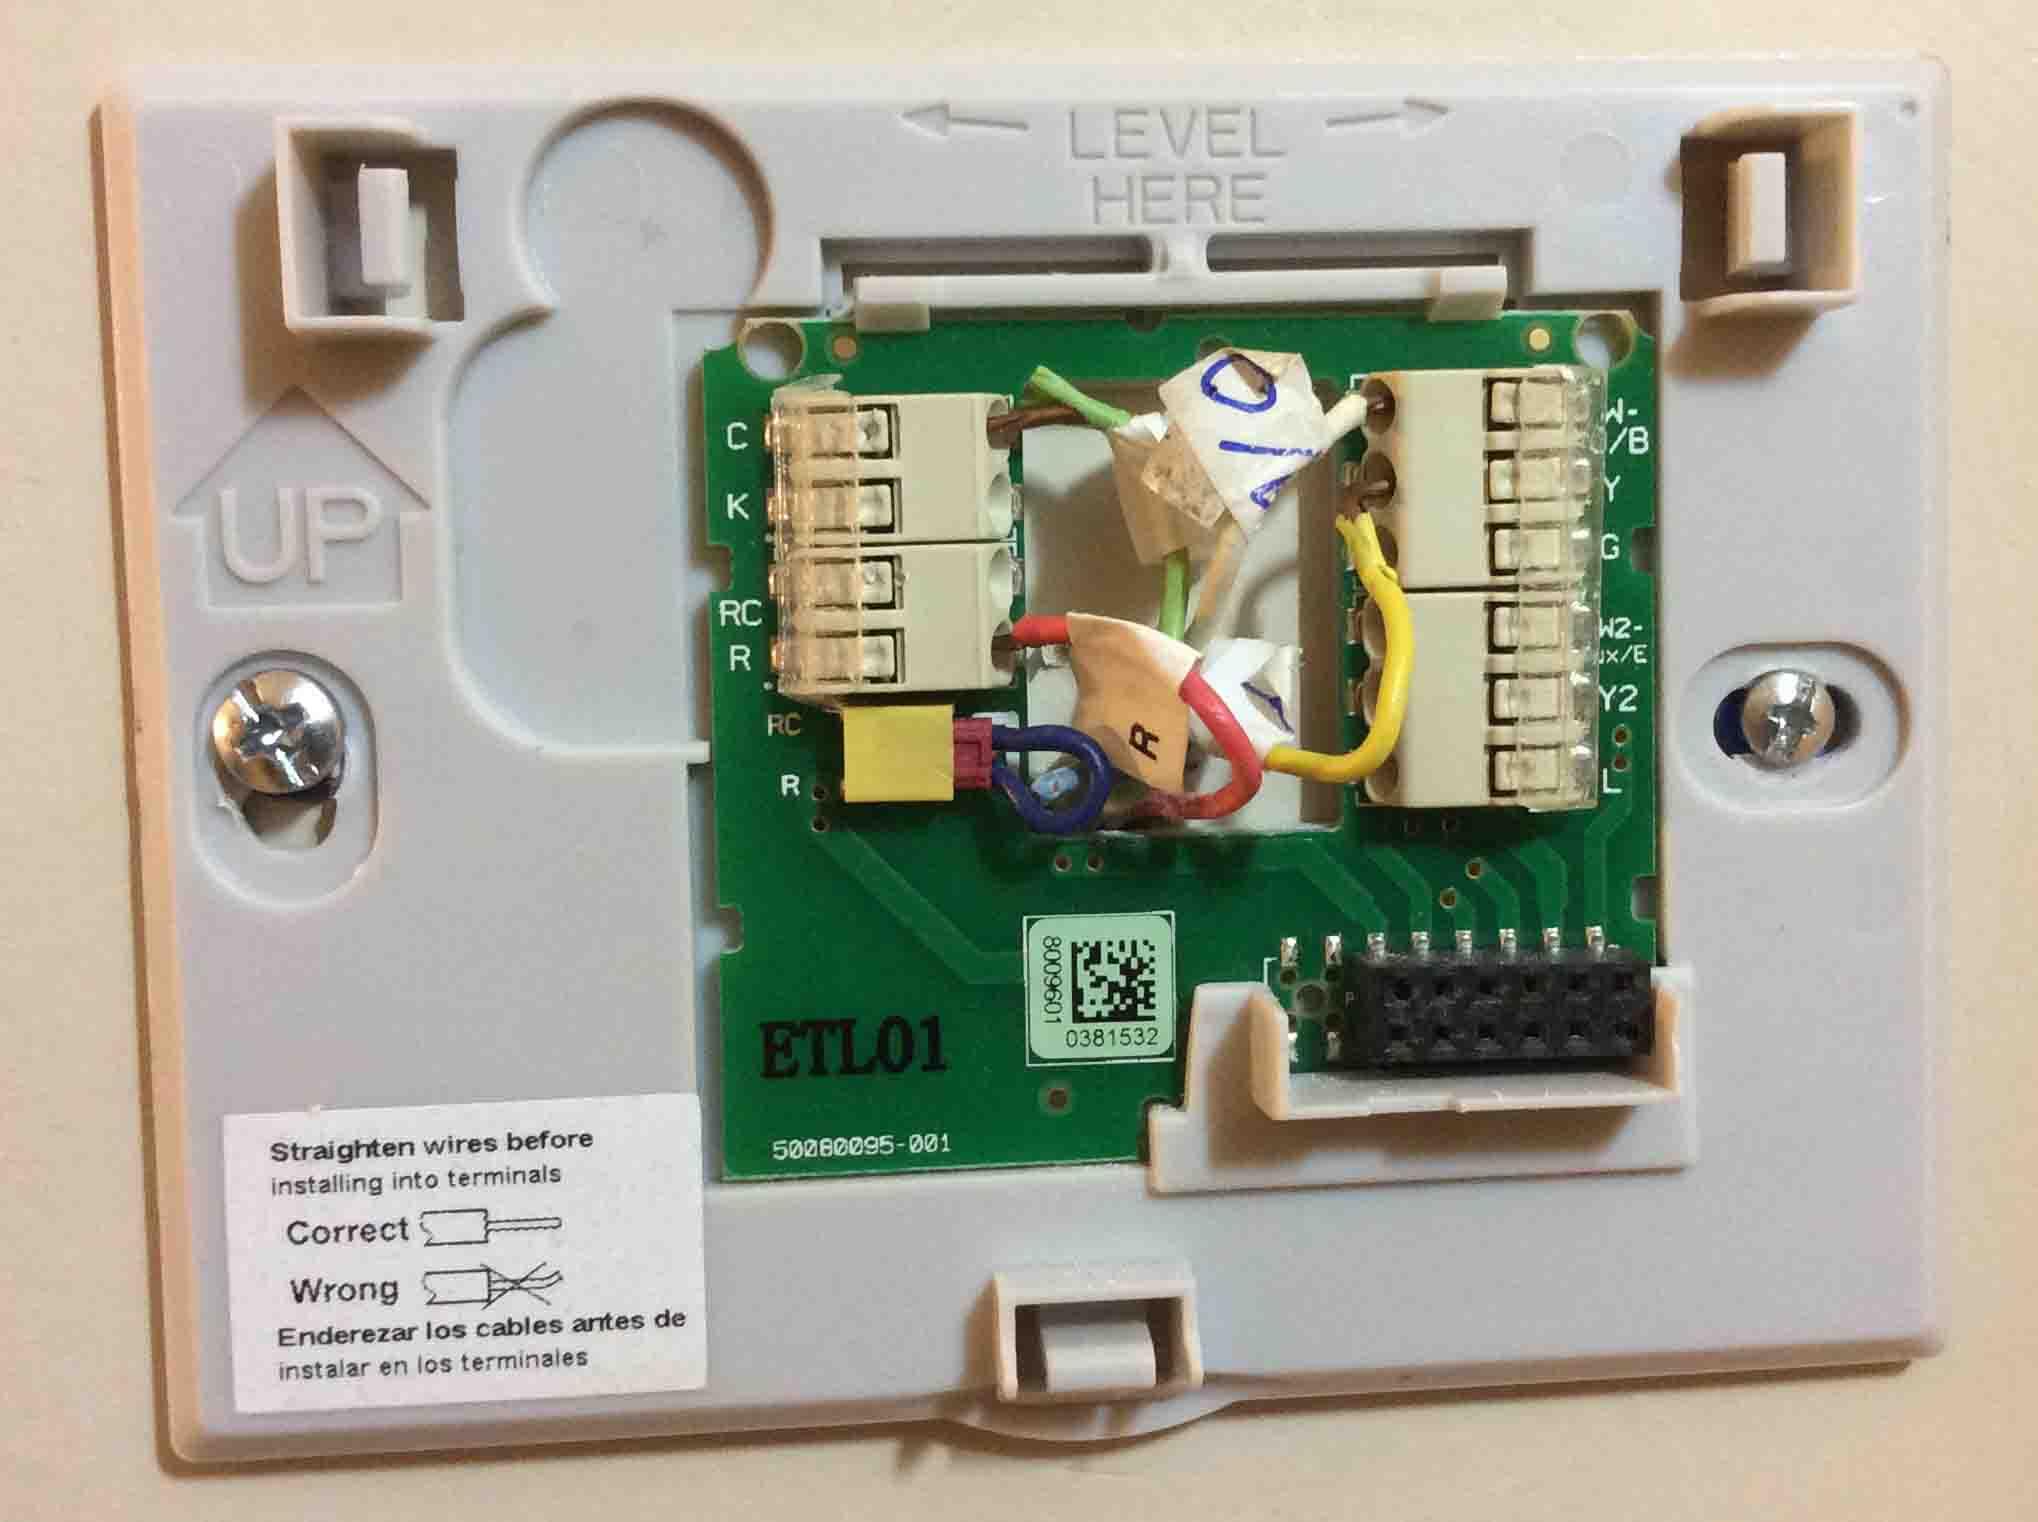 Wiring Diagram For Honeywell Th3210d1004 : Honeywell thermostat wiring diagram eureka vacuum